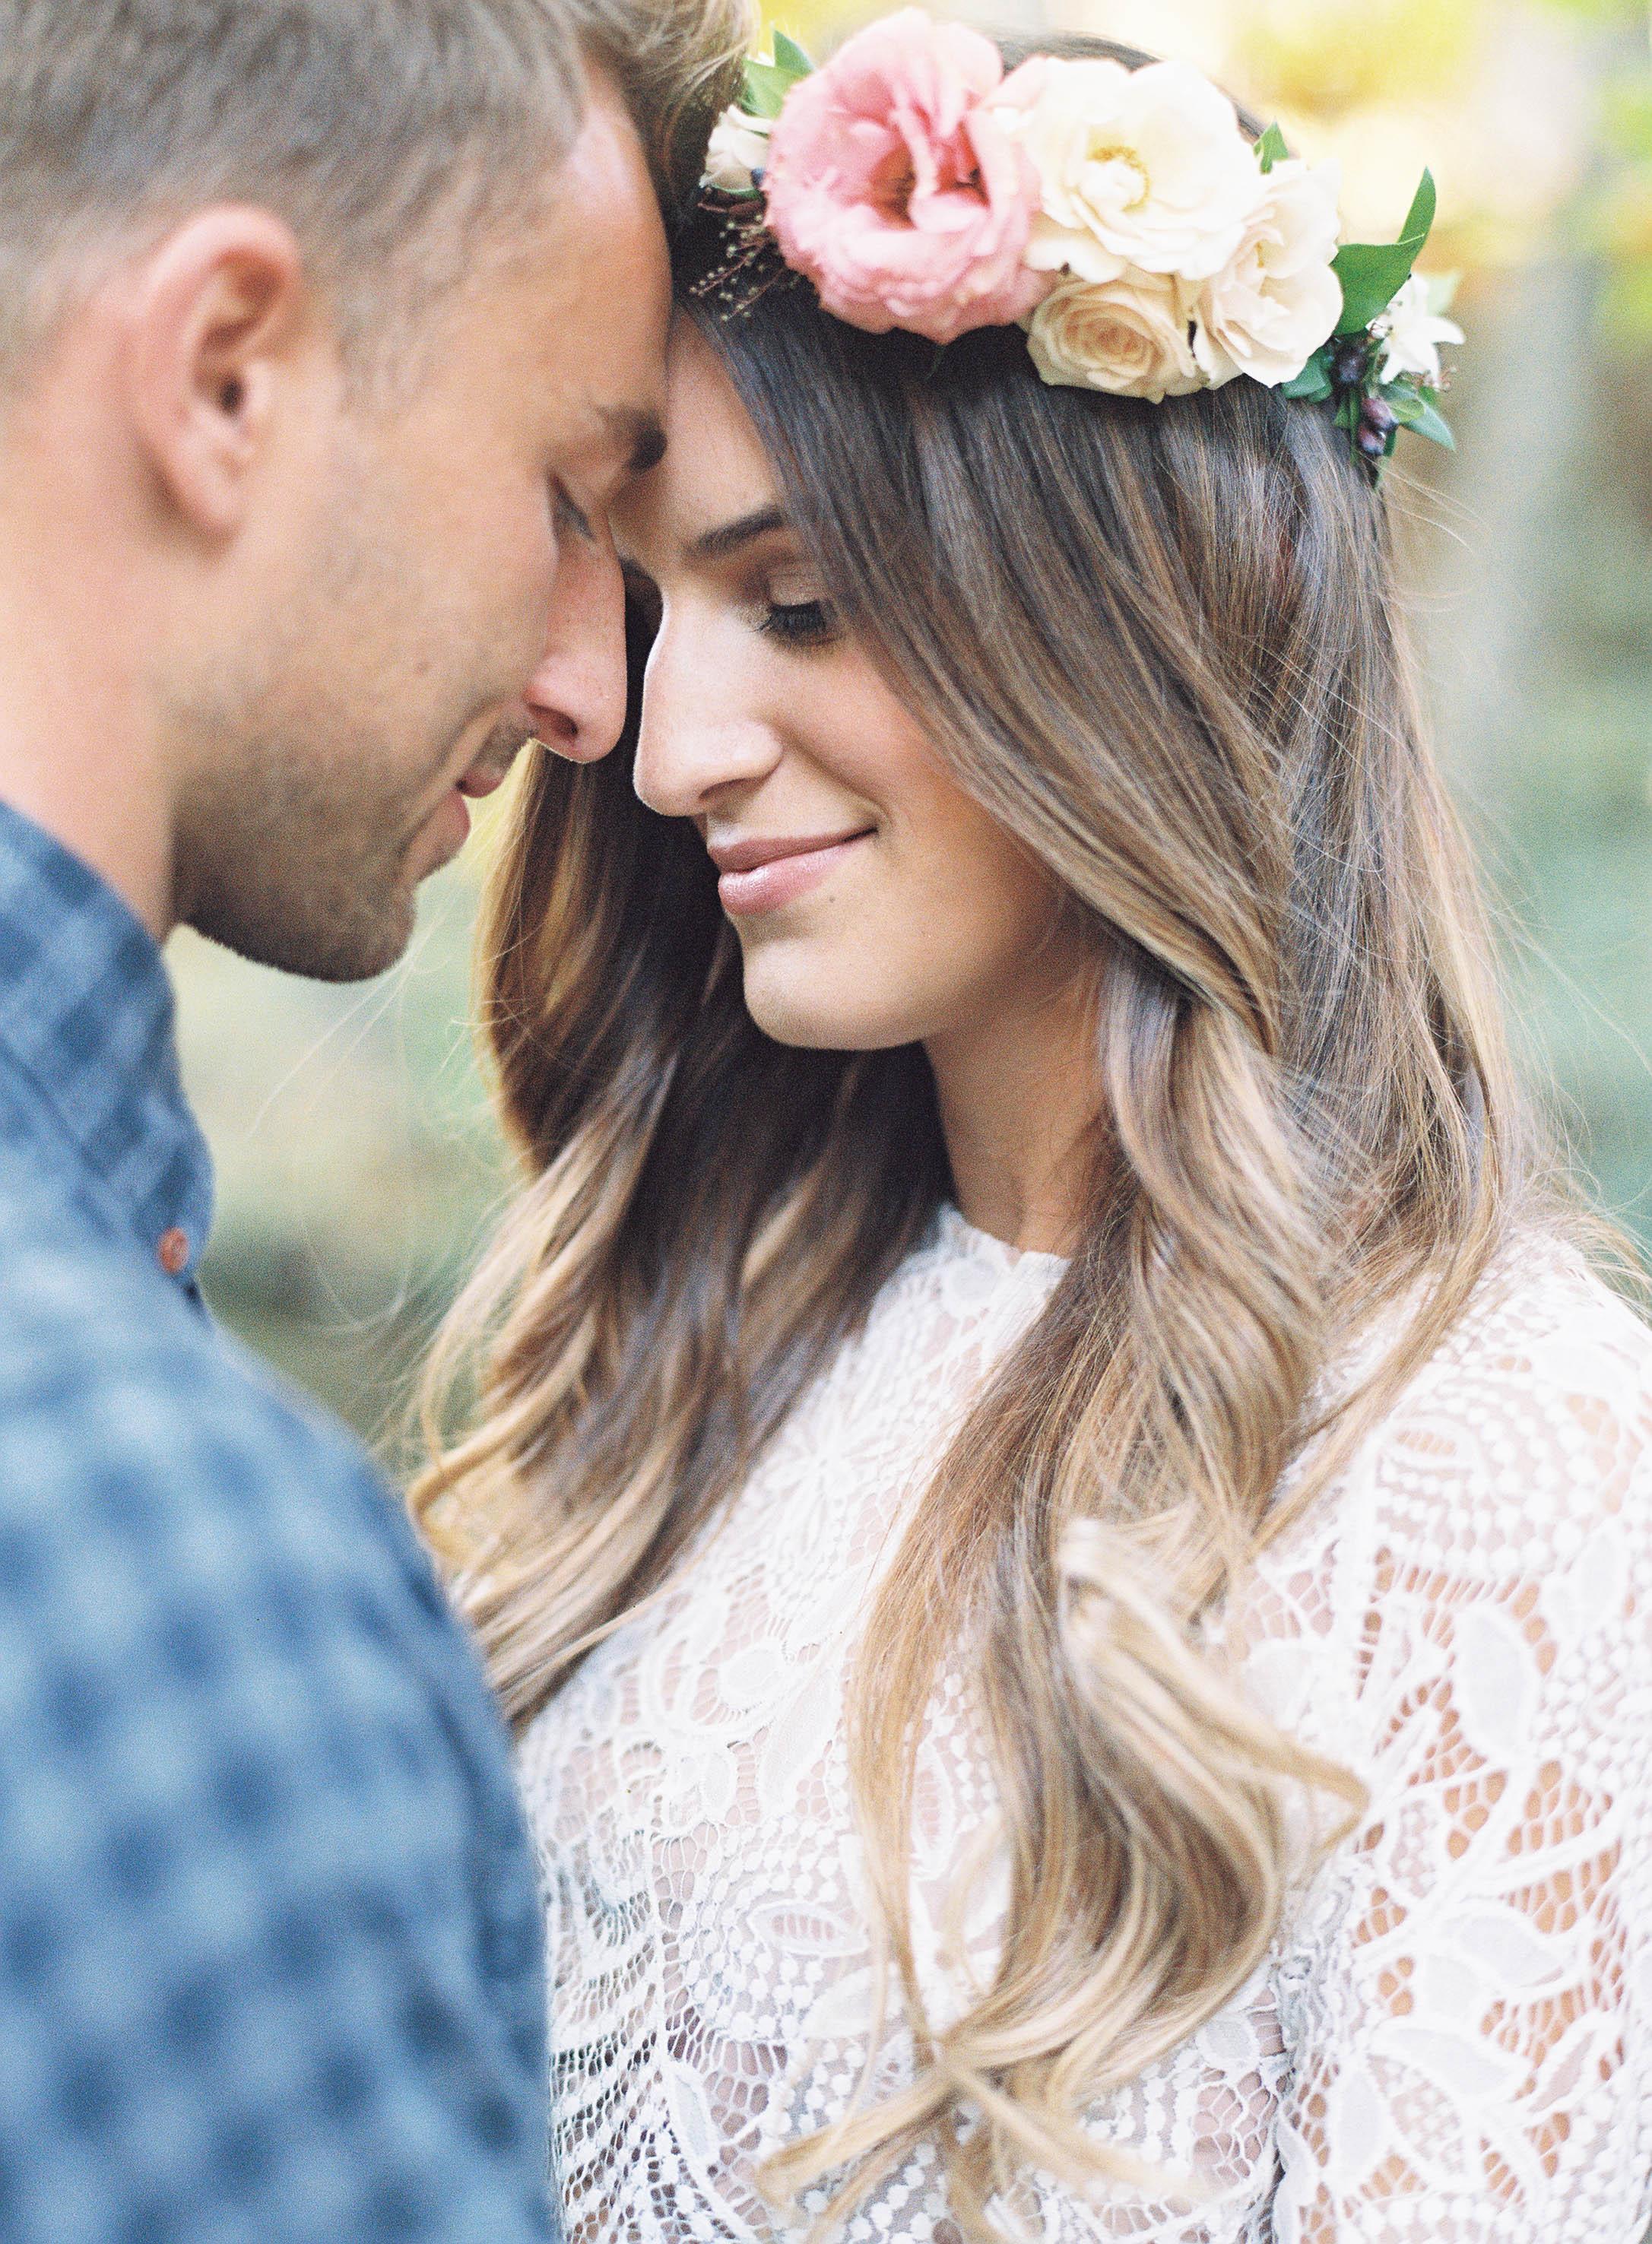 Meghan Mehan Photography - Fine Art Film Wedding Photography - San Francisco | Napa | Sonoma | Big Sur | Chicago | Minneapolis | Milwaukee | Lake Geneva | Door County | Wisconsin 050.jpg